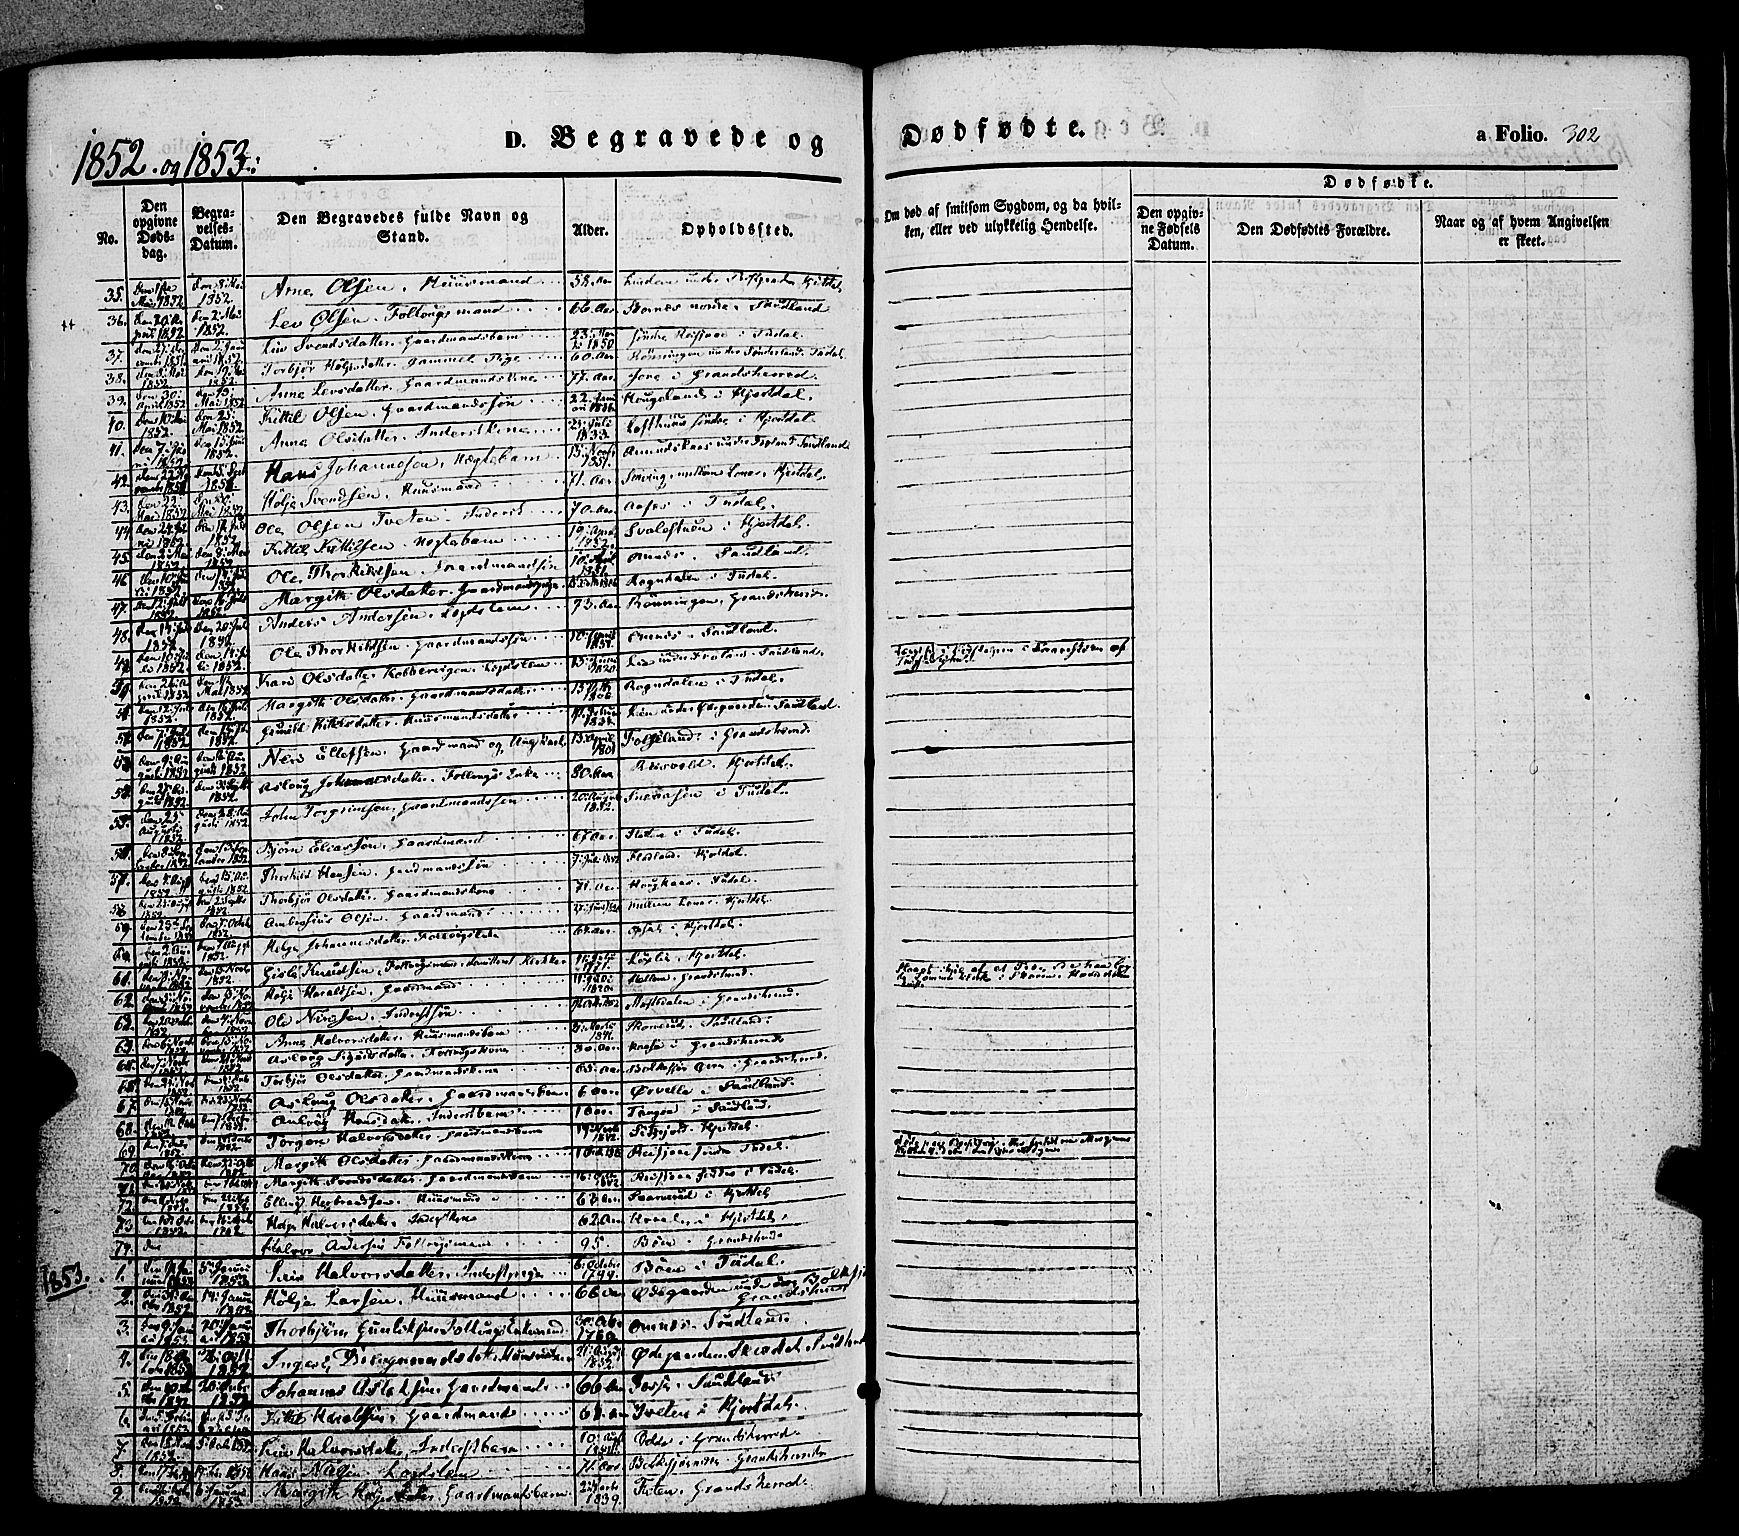 SAKO, Hjartdal kirkebøker, F/Fa/L0008: Ministerialbok nr. I 8, 1844-1859, s. 302